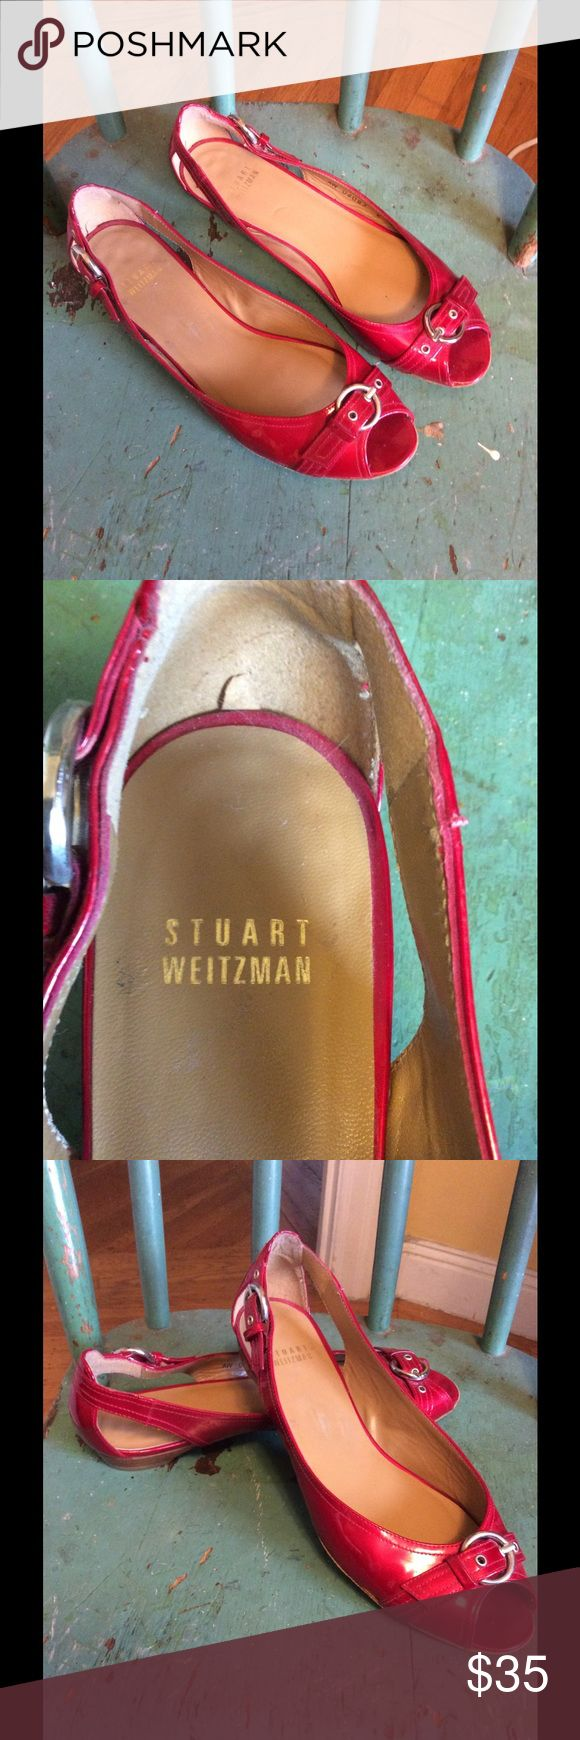 Stuart Wiseman red flats Beautiful Stuart Weitzman patent red peep toe flats Stuart Weitzman Shoes Flats & Loafers